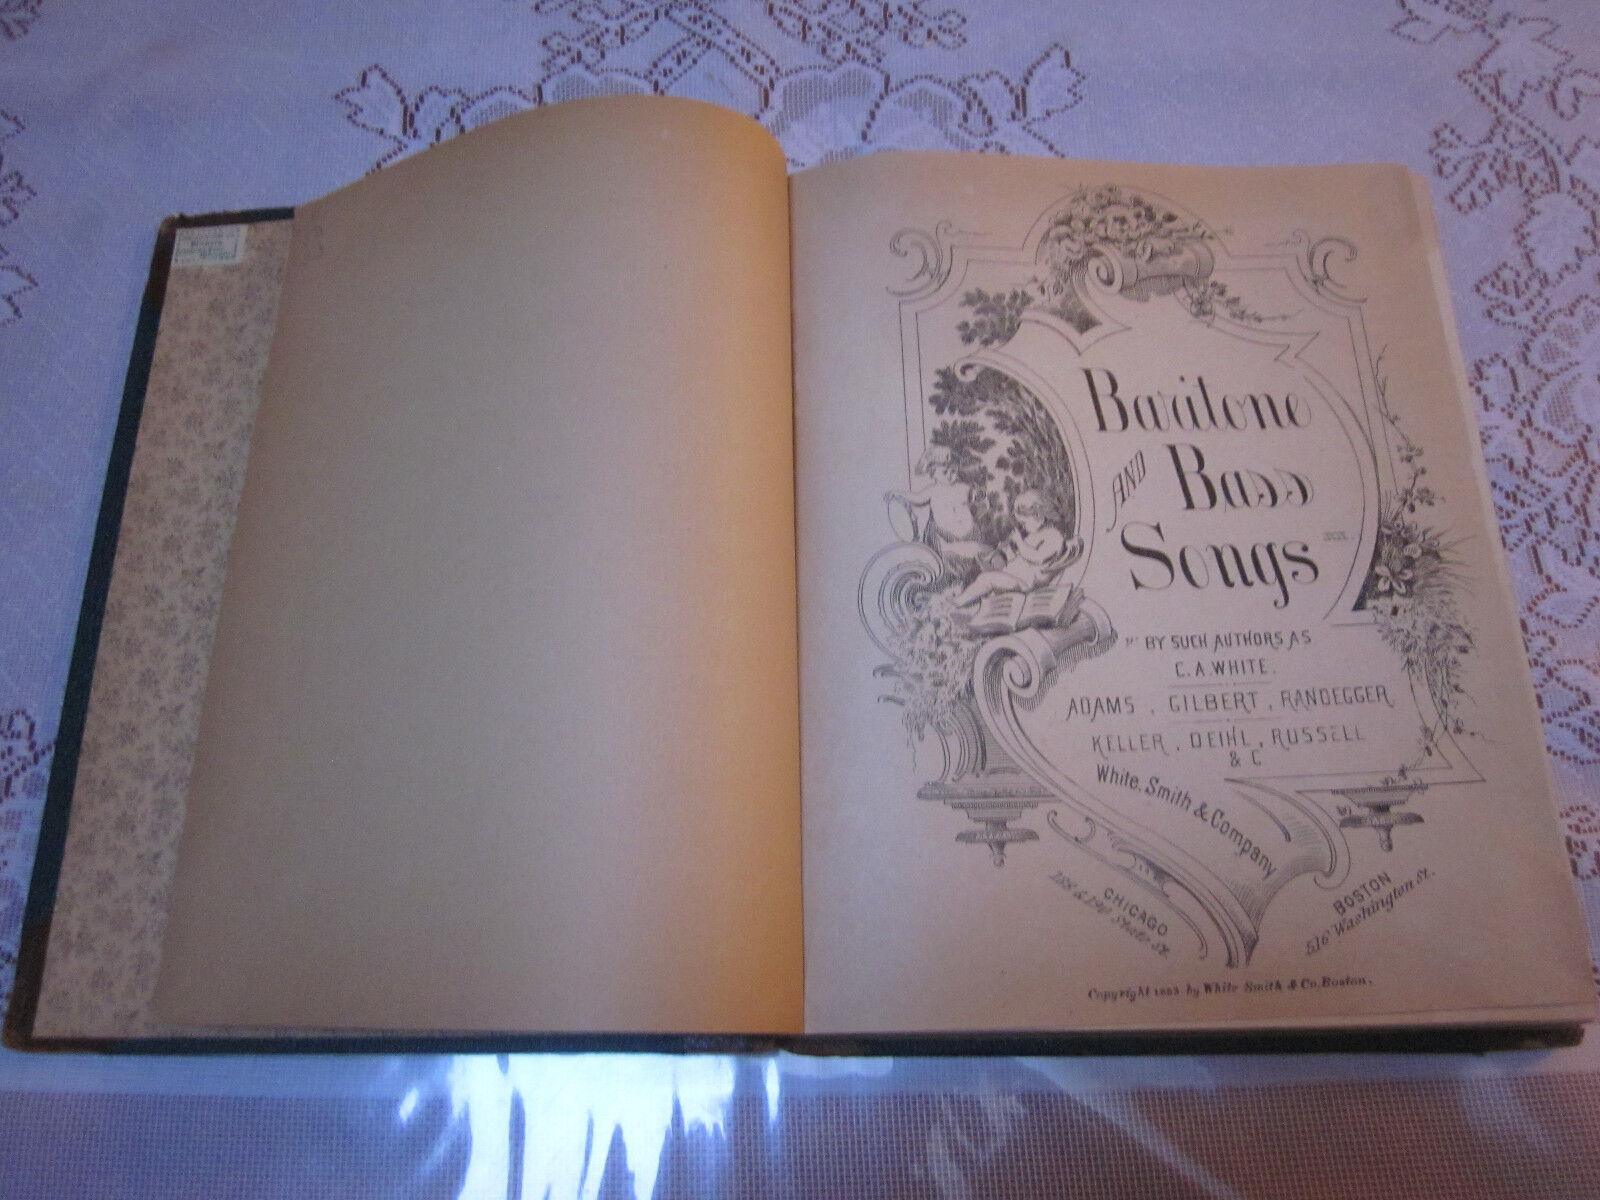 Bariton and Bass Songs; C.A Weiß et.al.  1883